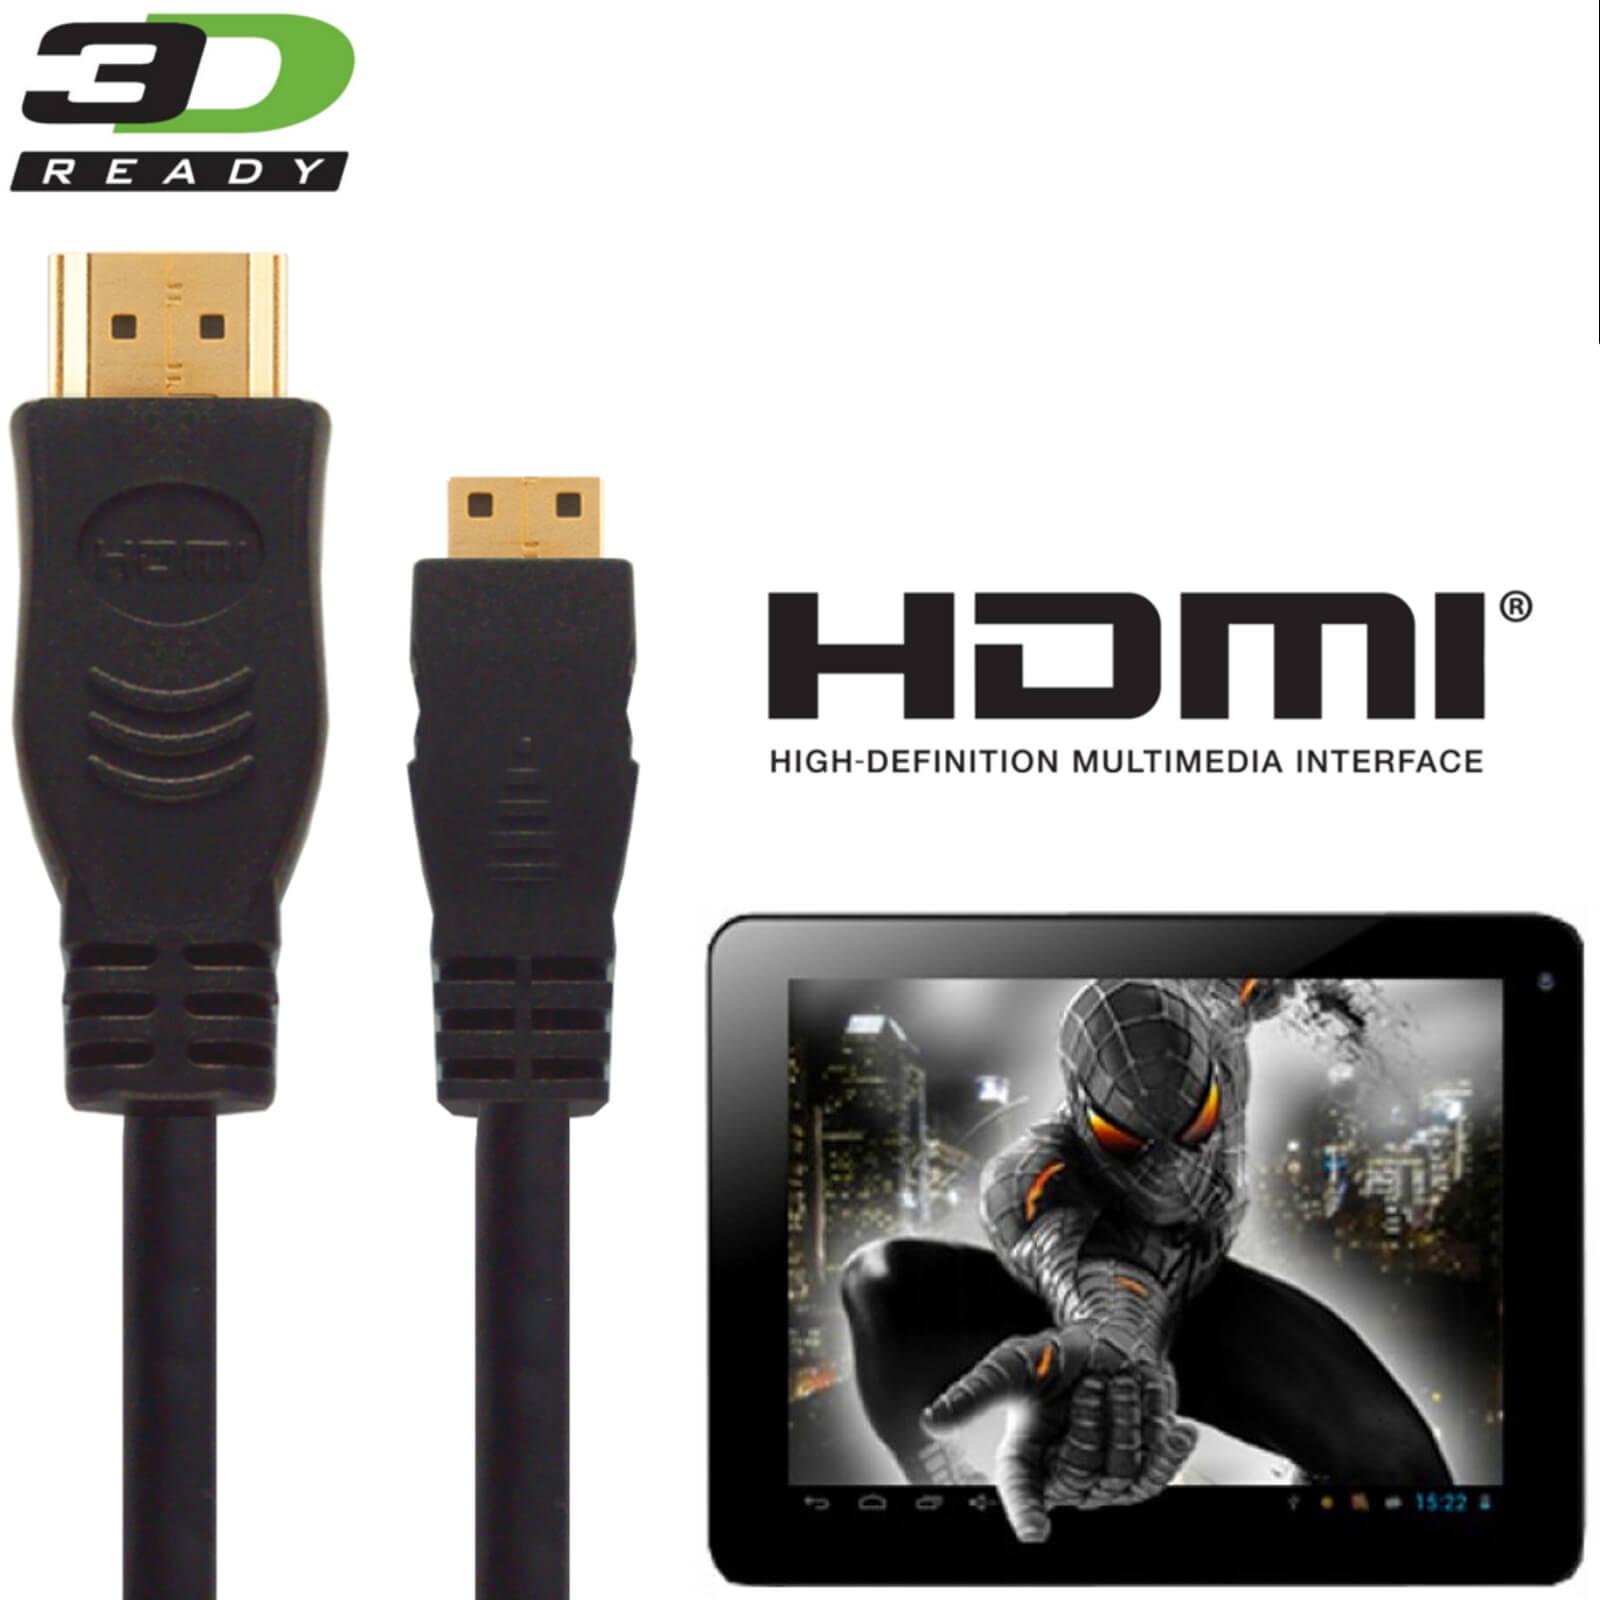 PolaTab Tablet PC HDMI Mini to HDMI TV 3m Gold Cord Wire Lead Cable ...